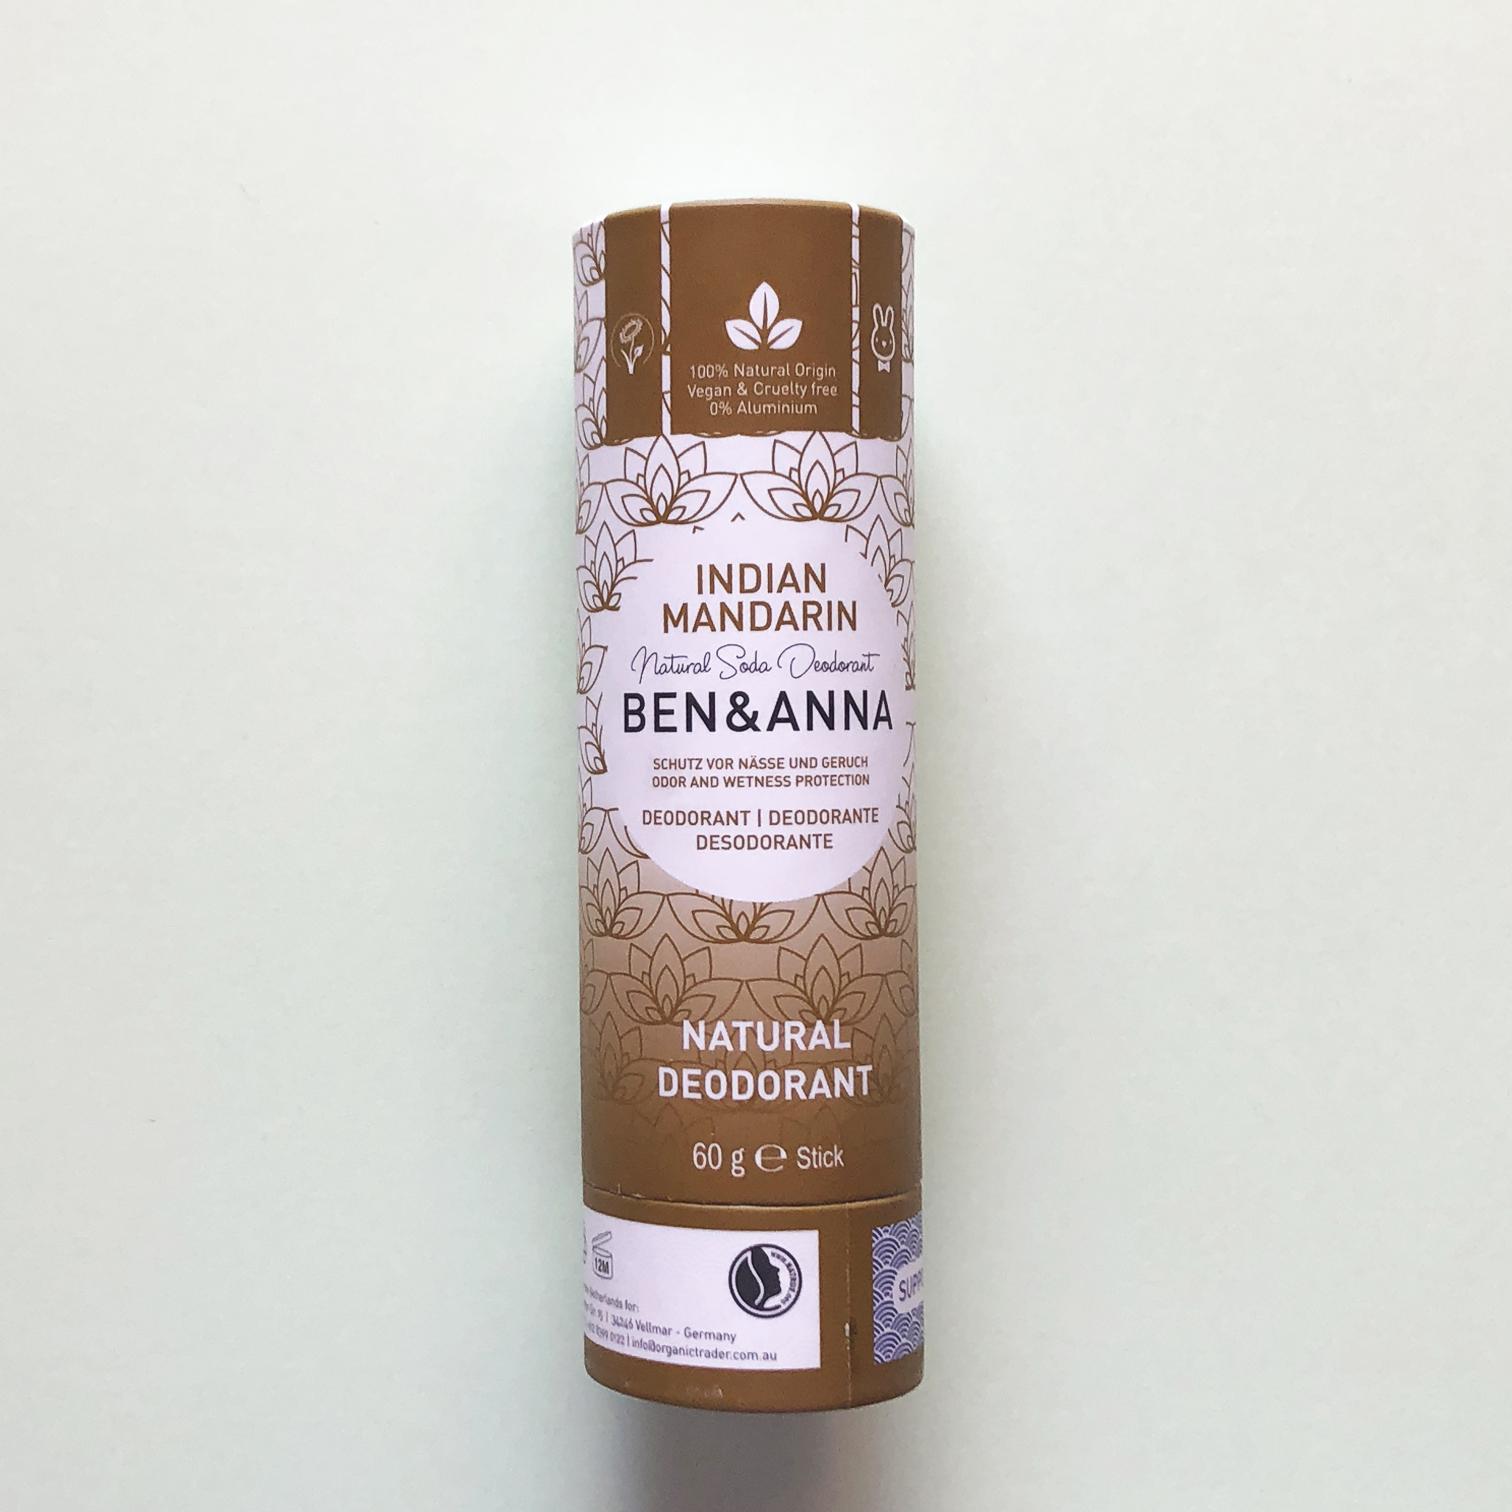 Desodorante vegano natural en stick Ben & Anna - Potions BCN